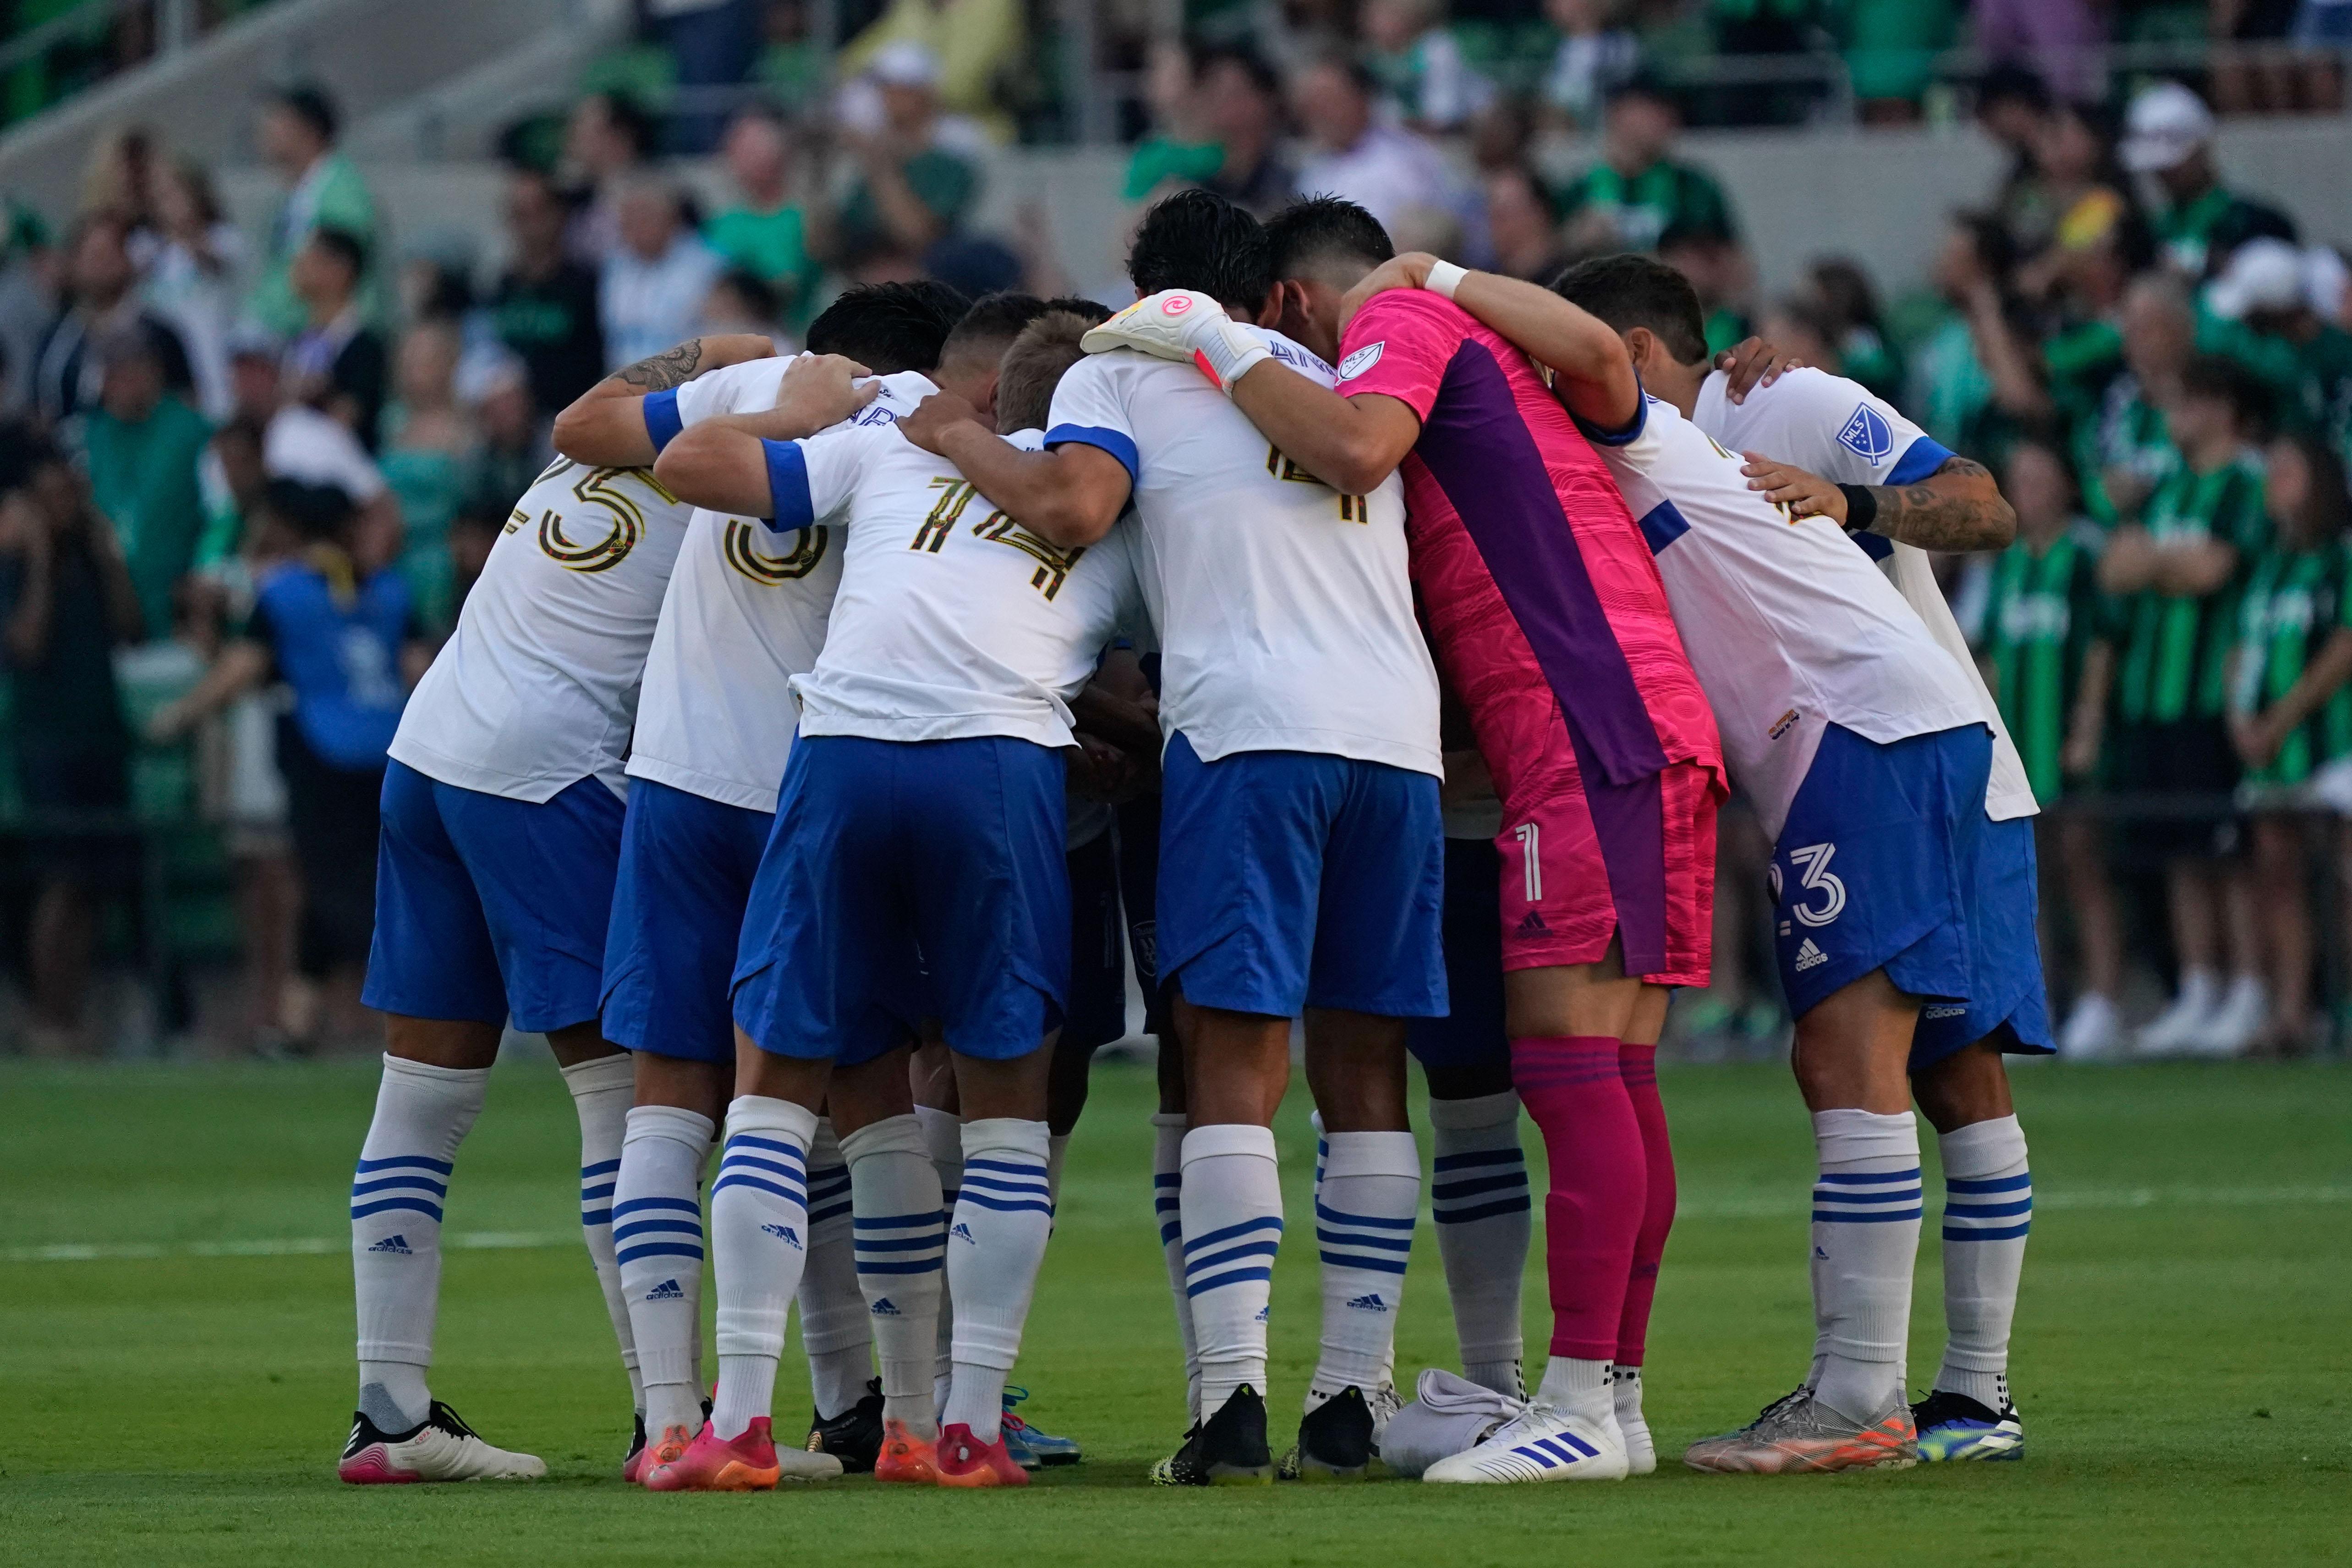 MLS: San Jose Earthquakes at Austin FC